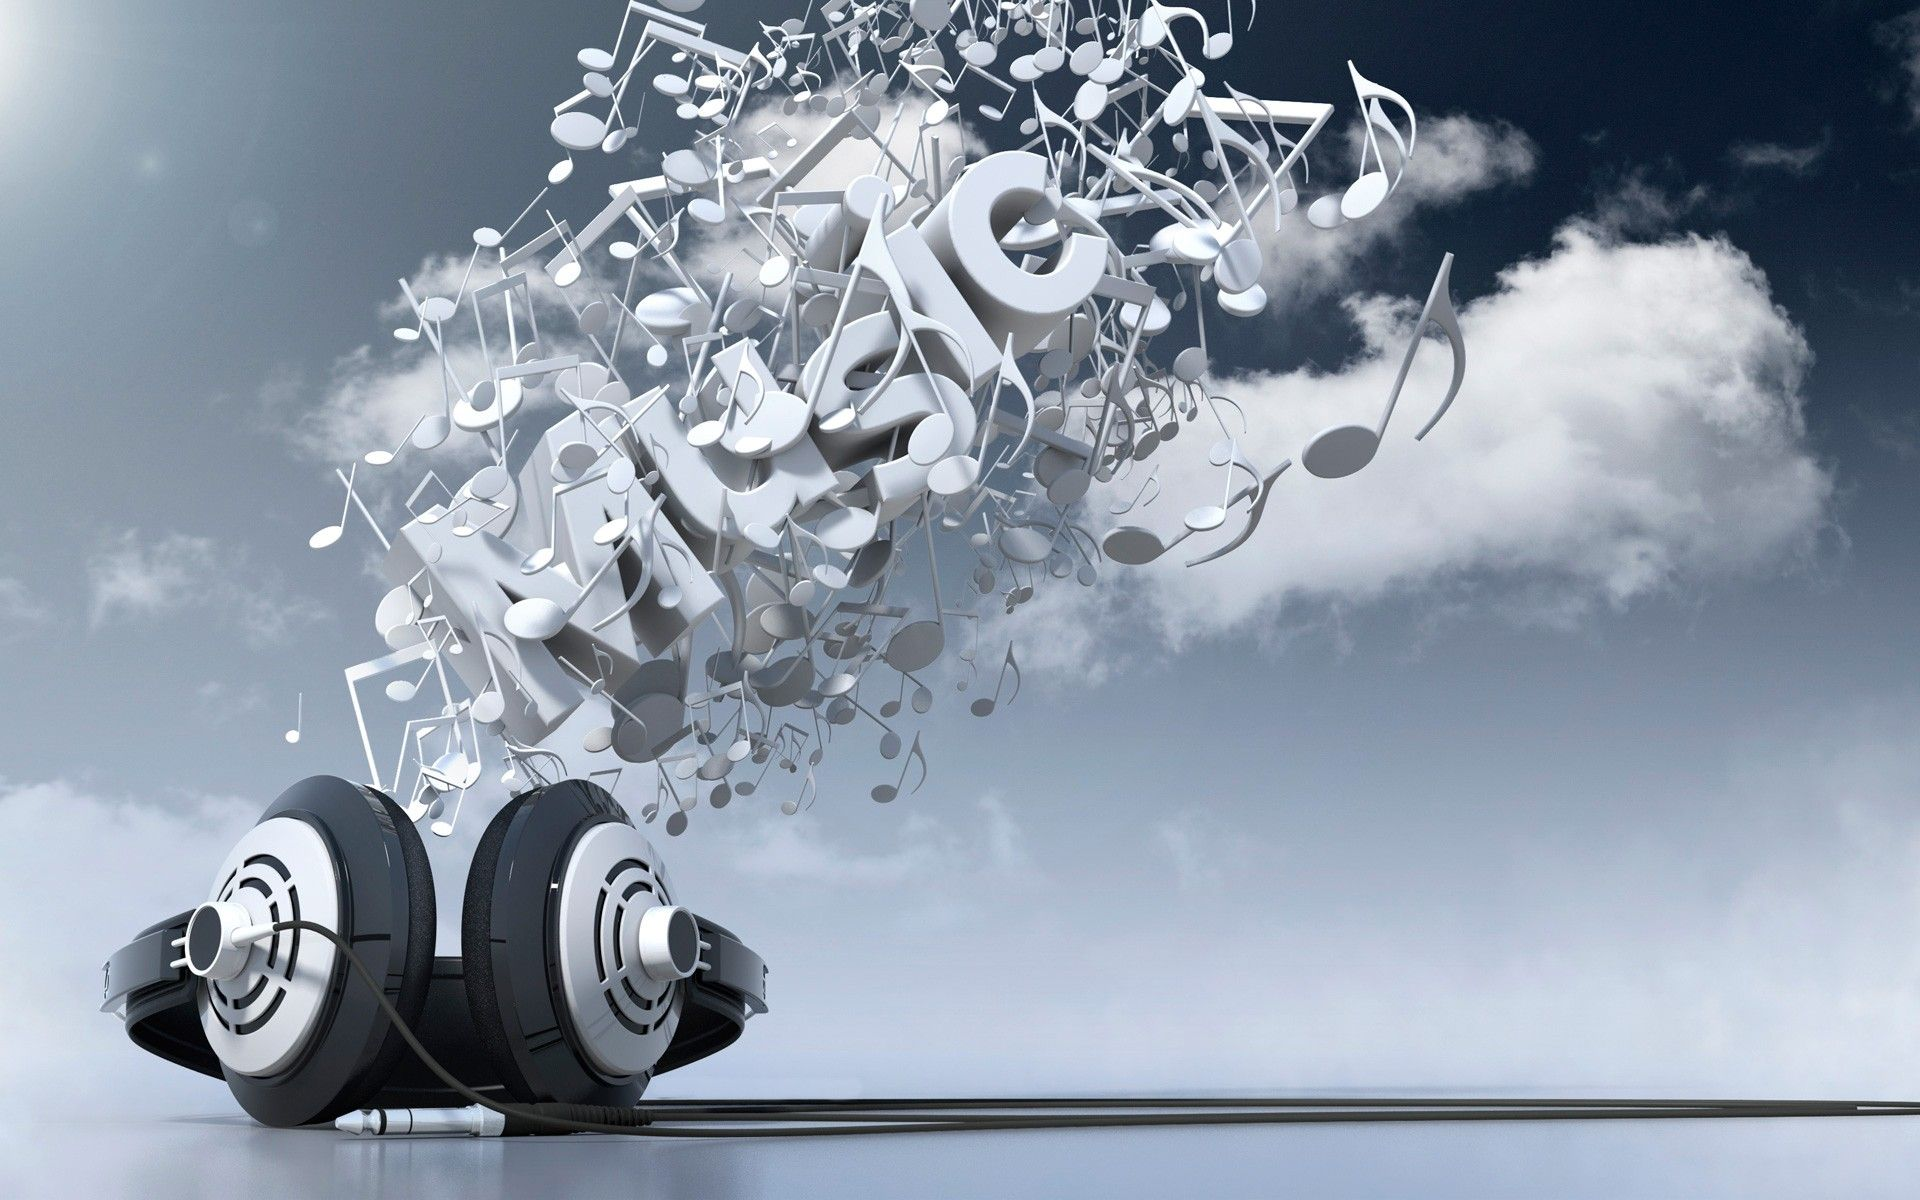 headphones music Headpool / 1920x1200 Wallpaper | Headphones | Pinterest